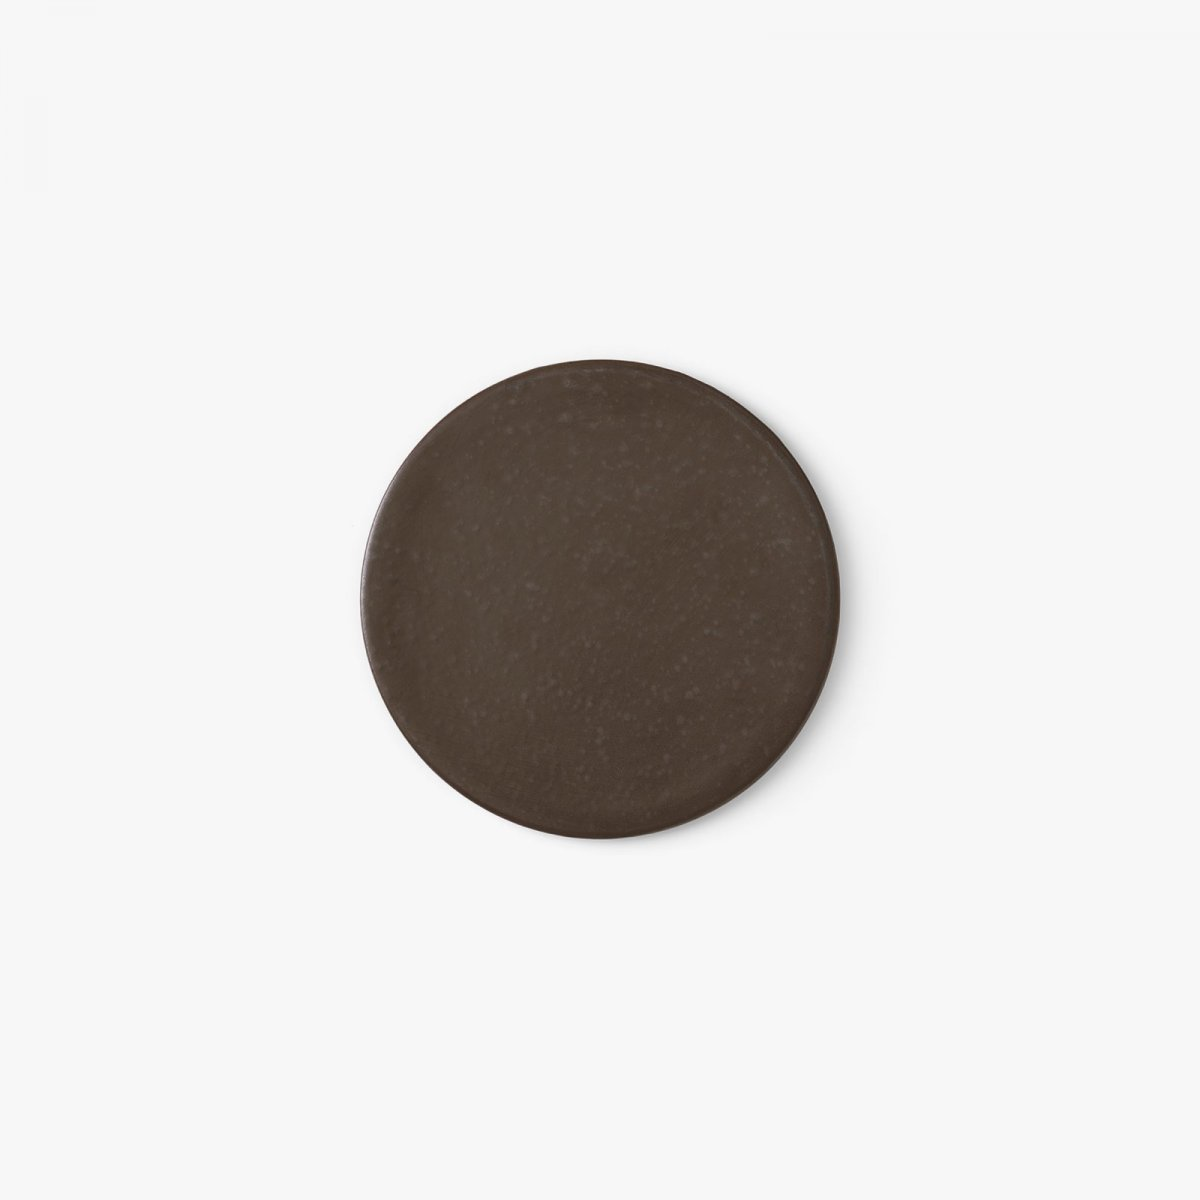 New Norm Plate/Lid, Ø 17.5 cm, dark glazed.